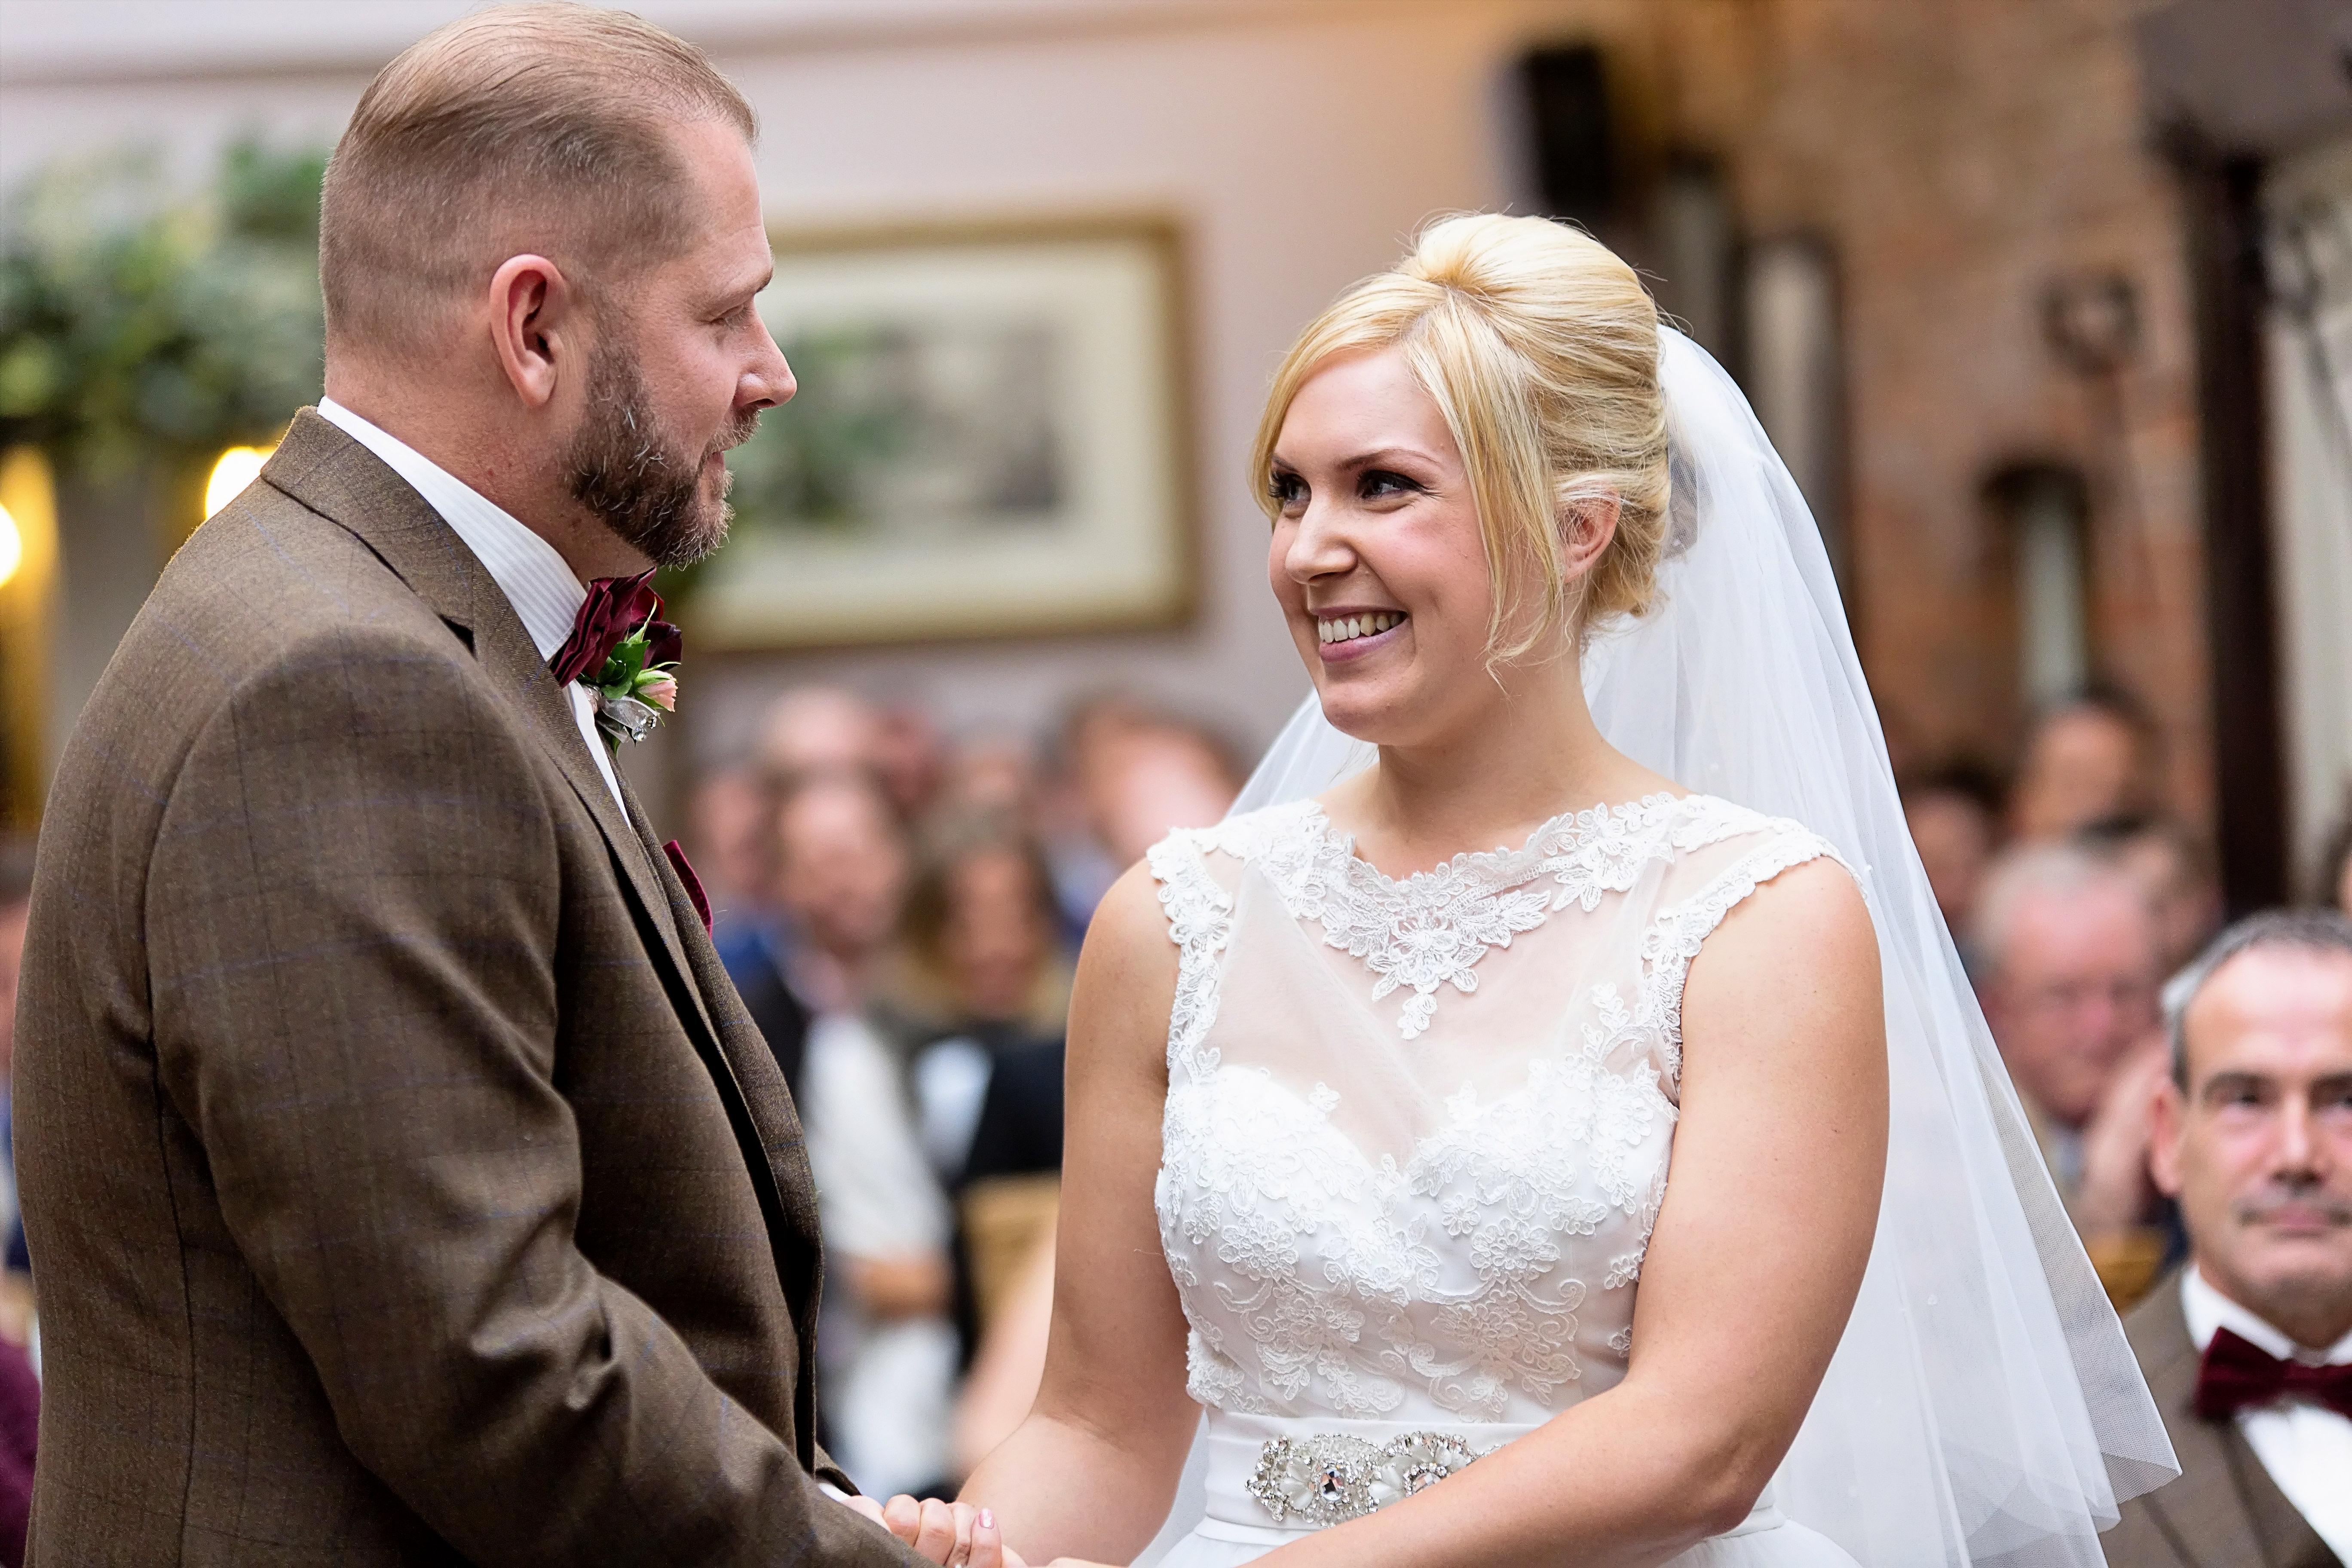 South West | Hampshire | Lymington | Winter | Traditional | Christmas | Maroon | Brown | Hotel | Real Wedding | Jennie Franklin #Bridebook #RealWedding #WeddingIdeas Bridebook.co.uk